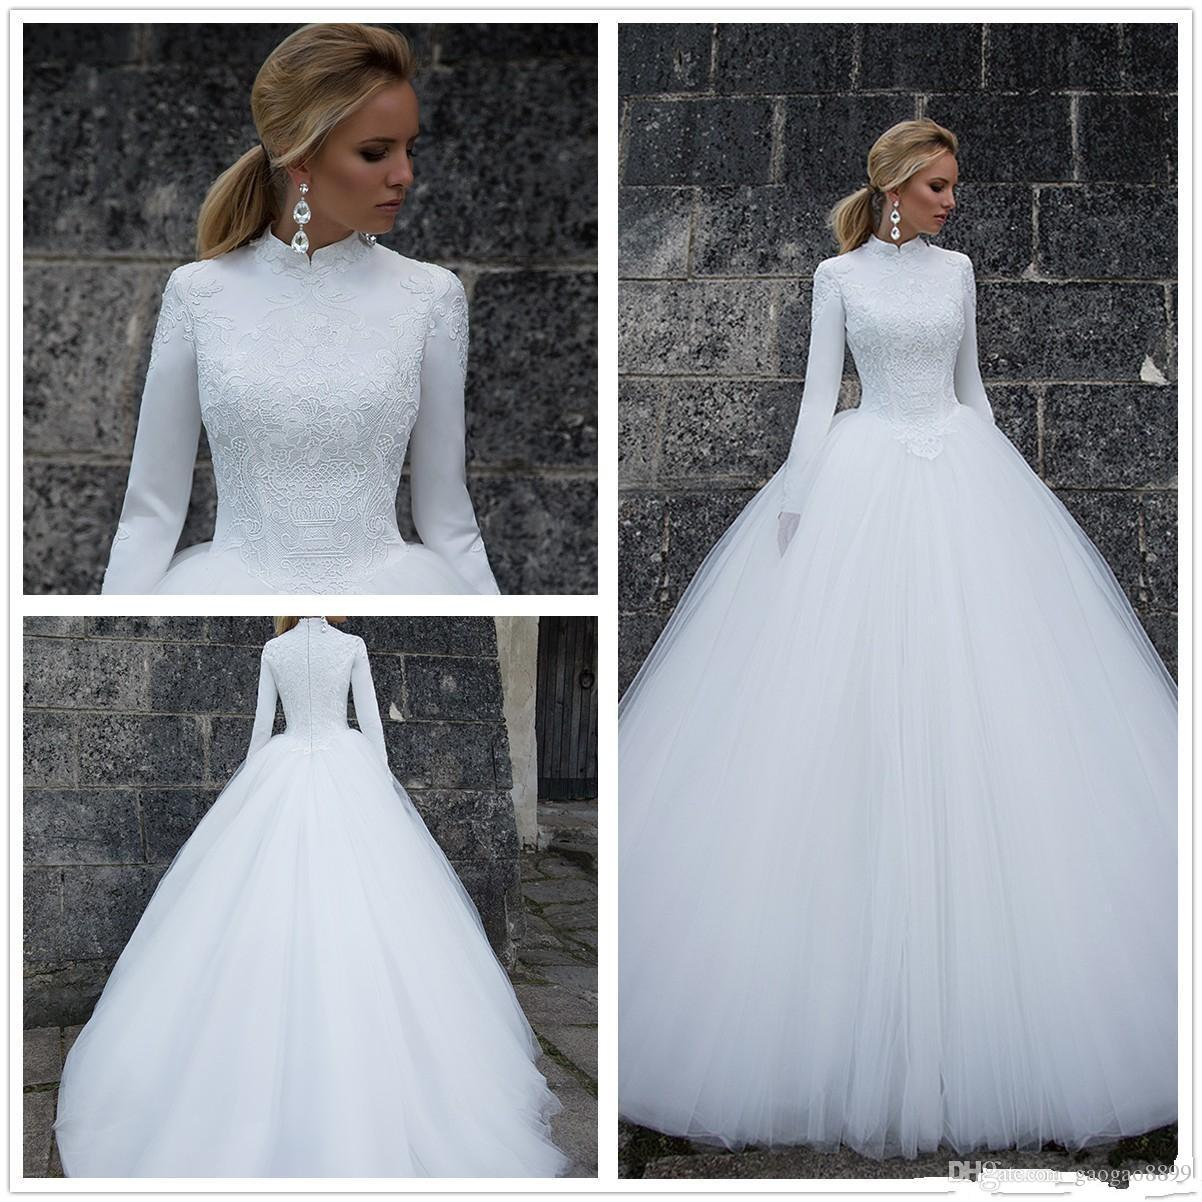 Muslim Lace Wedding Dresses 2018 A Line High Neck Long Sleeves Satin Lace Applique Zipper Tulle Winter Wedding Bridal Gowns robe de mariée